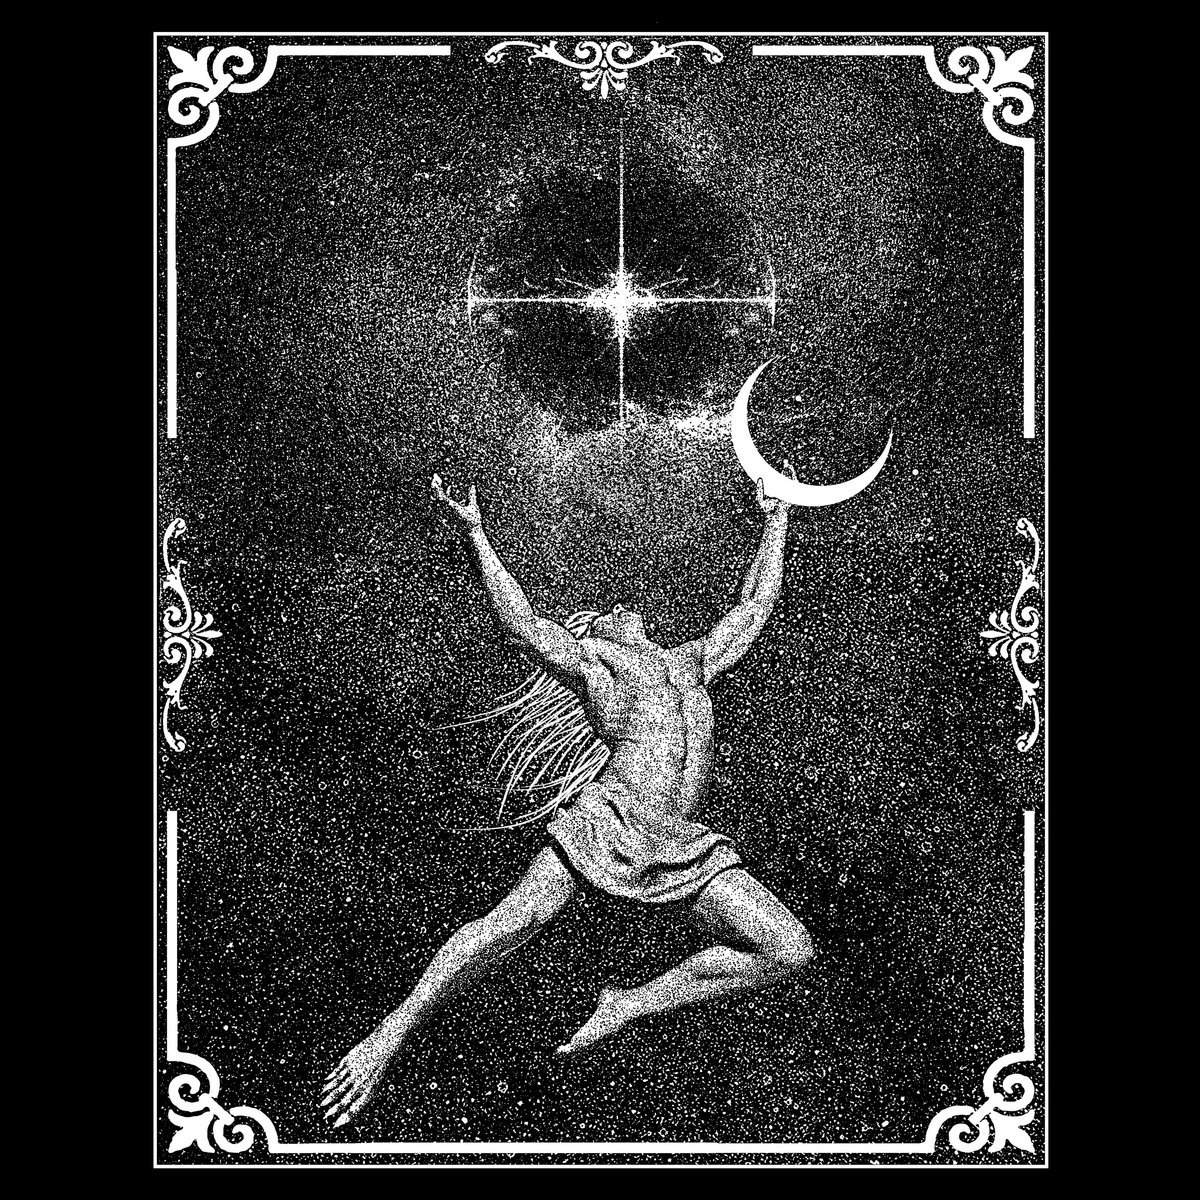 Dïatrïbe - Odite Sermonis